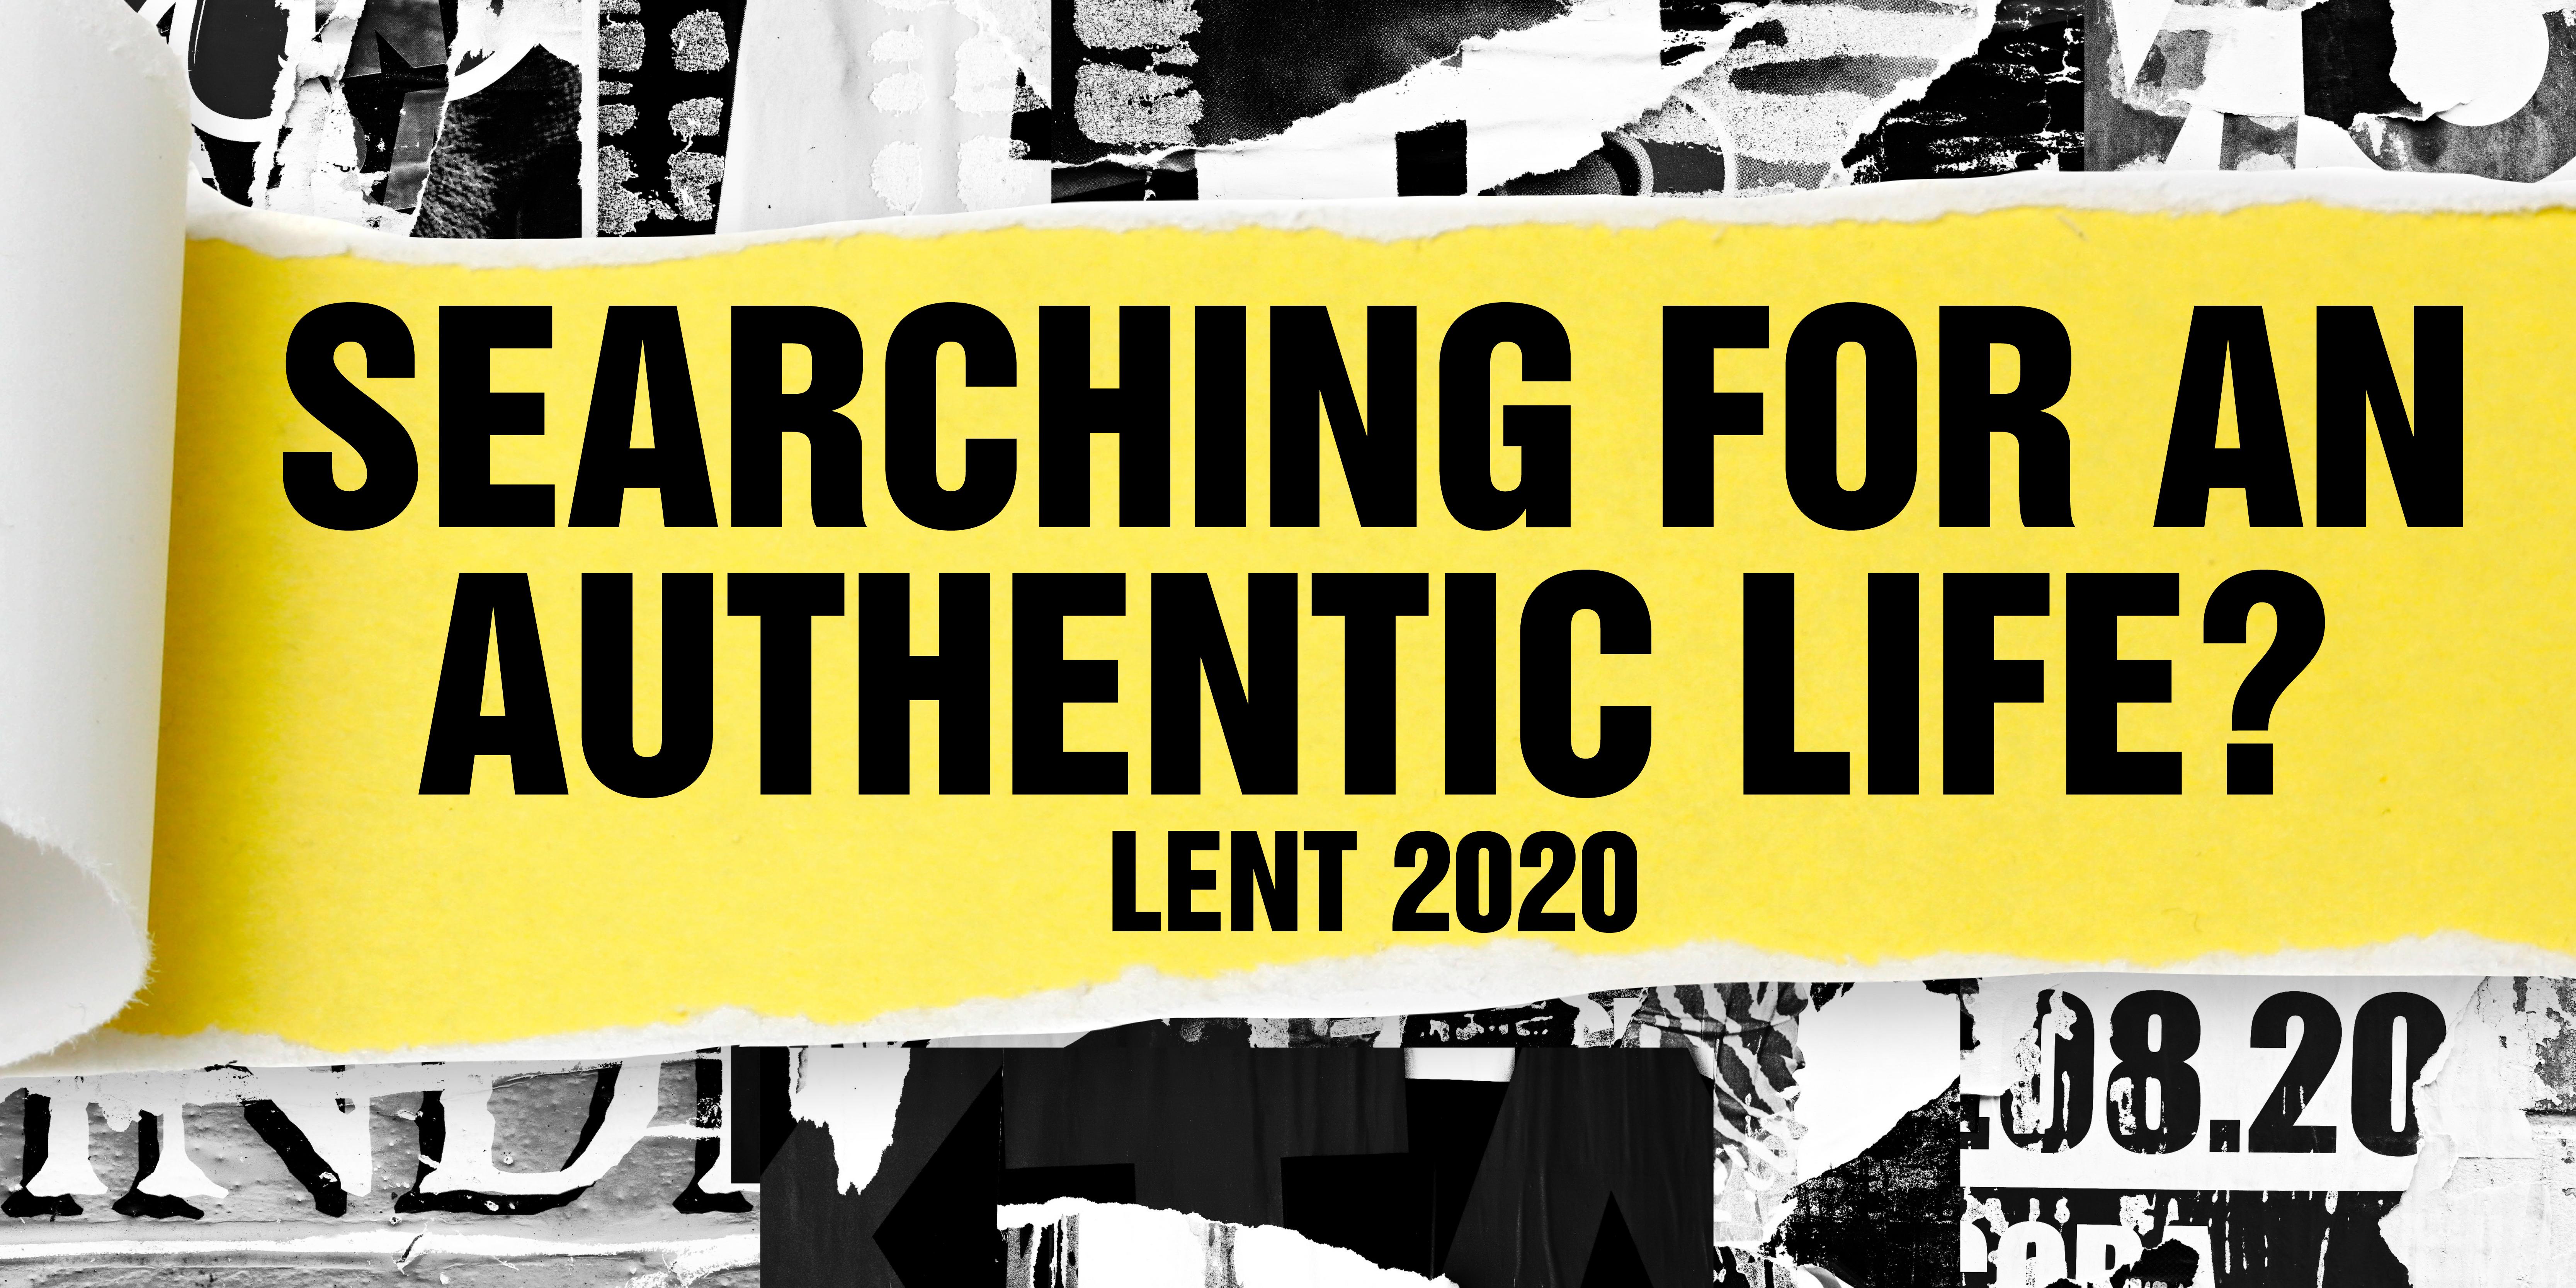 Lent at Fifth Avenue